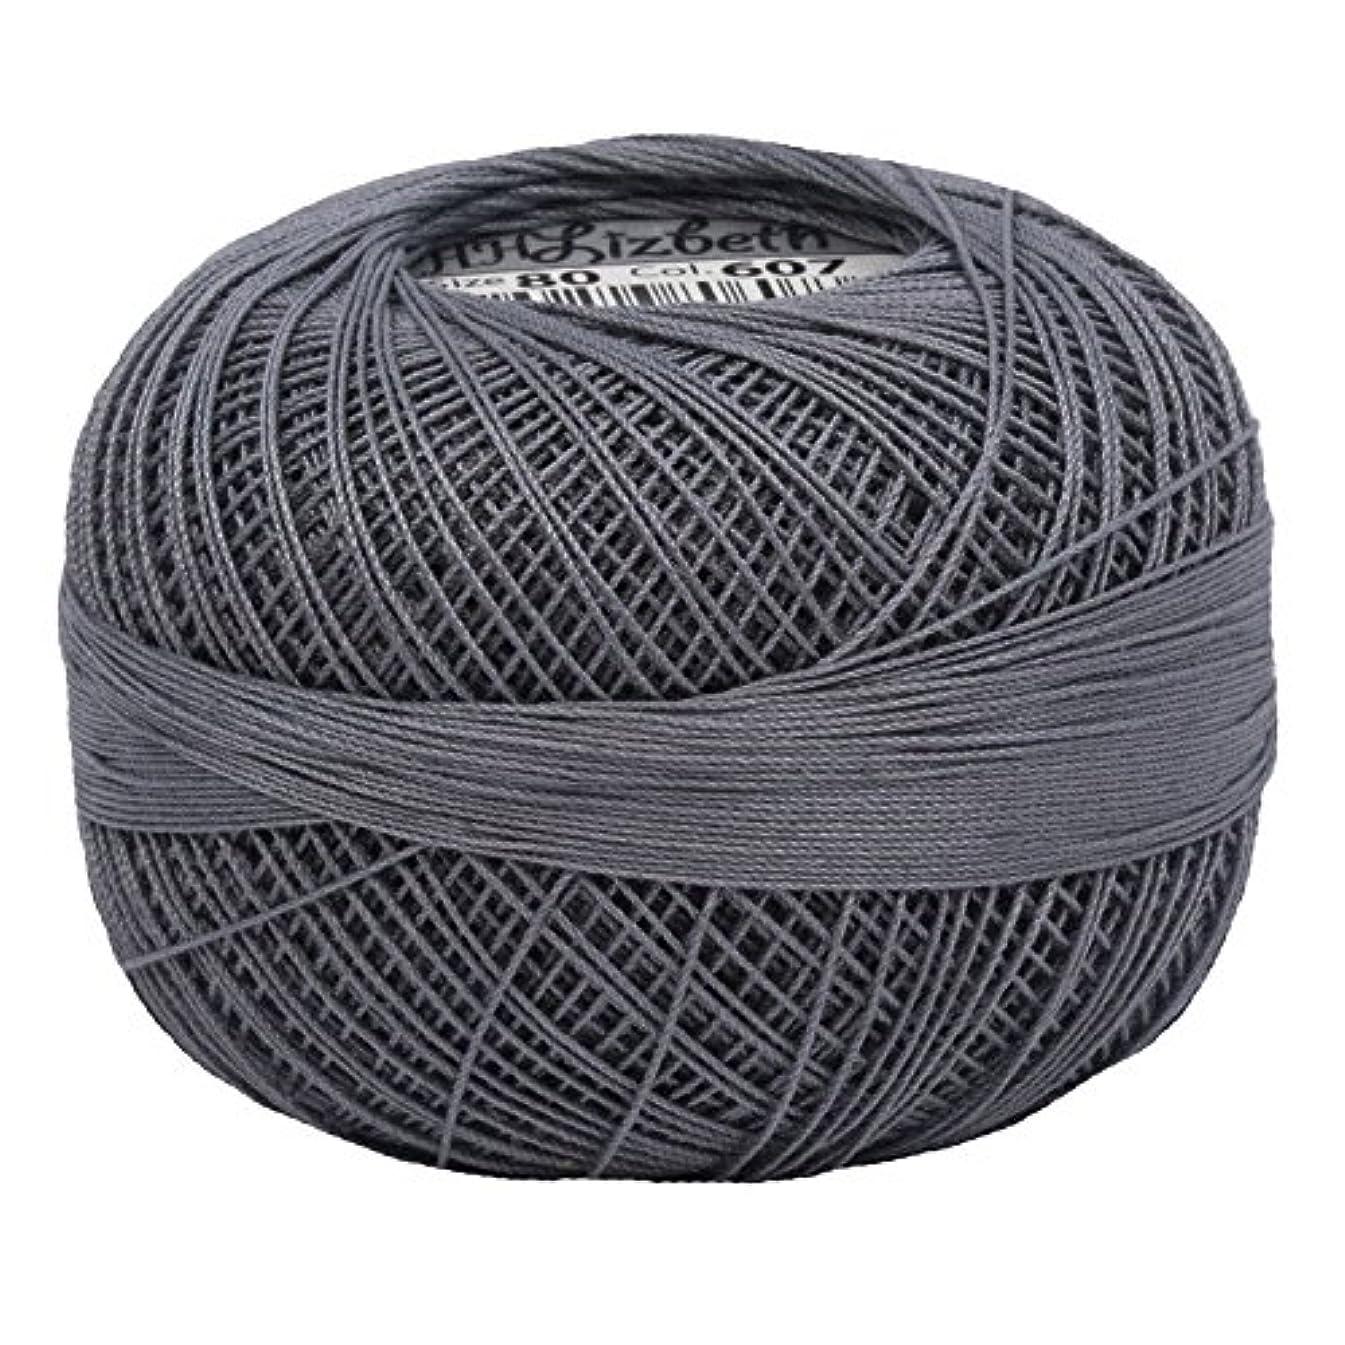 Lizbeth Size 80 HH80 Lizbeth Cotton Thread 184 yds 10 Grams, Charcoal Medium